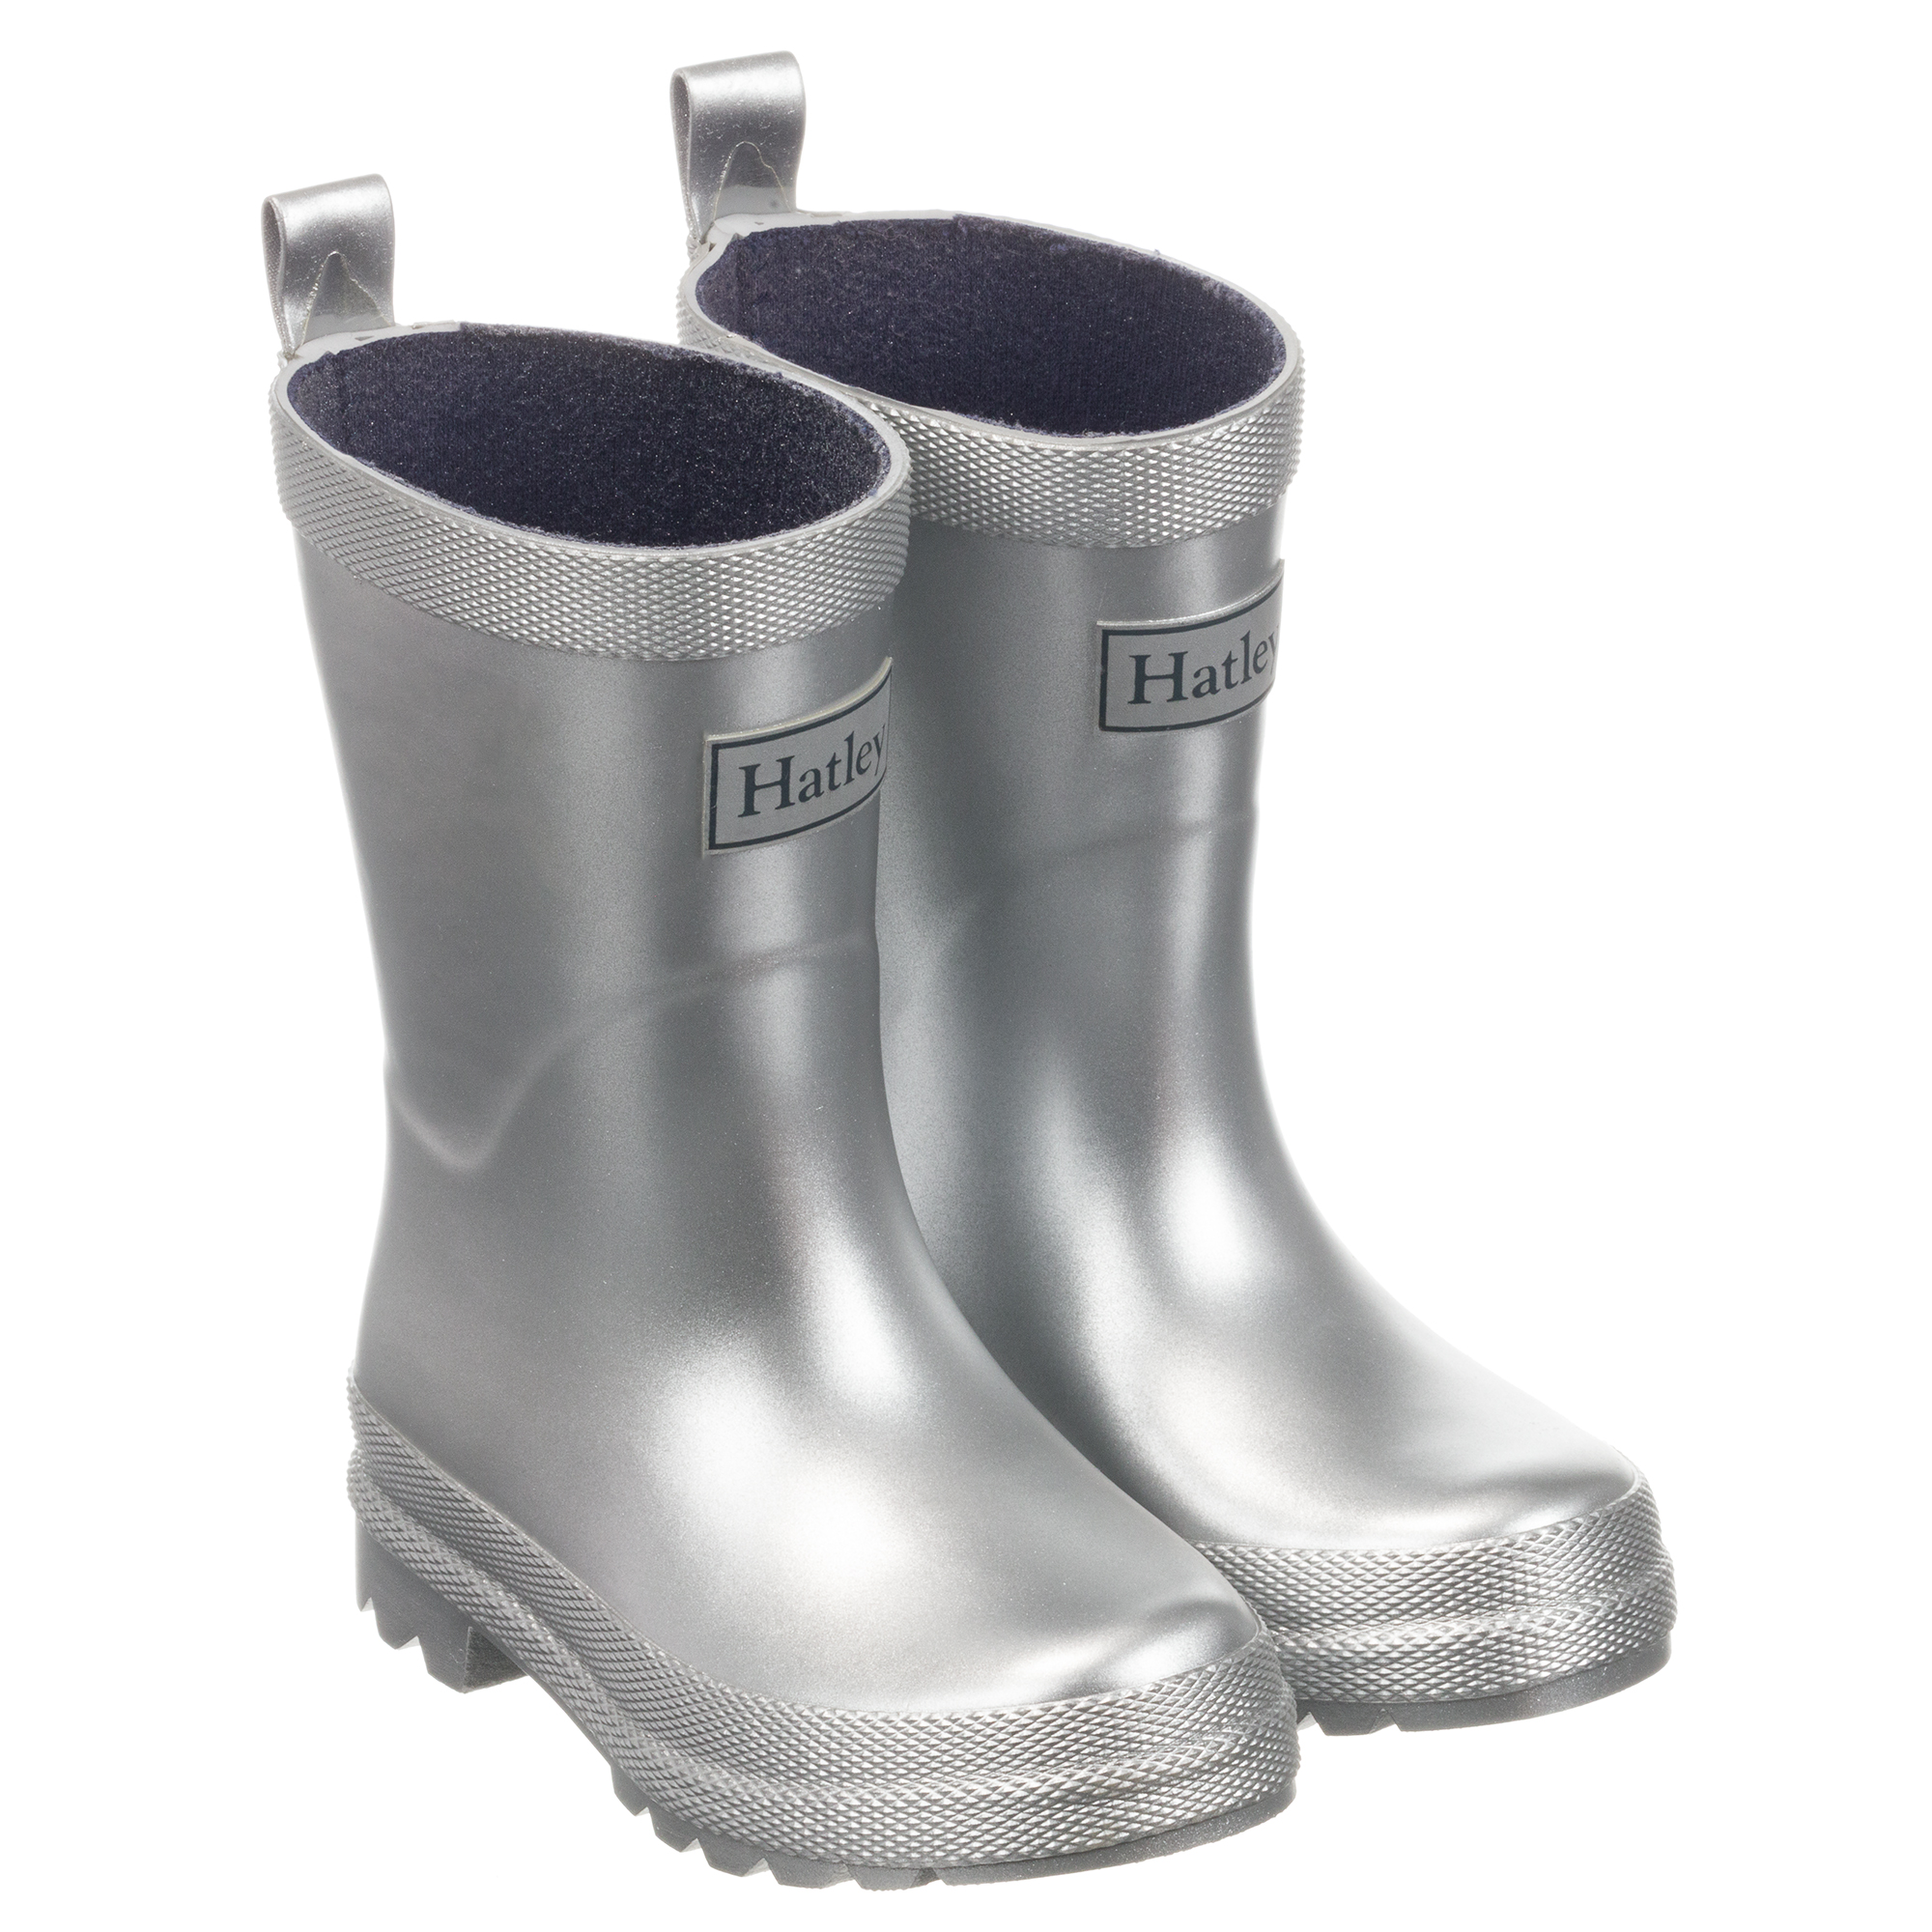 Hatley Boys Neoprene Boots Snowsuit